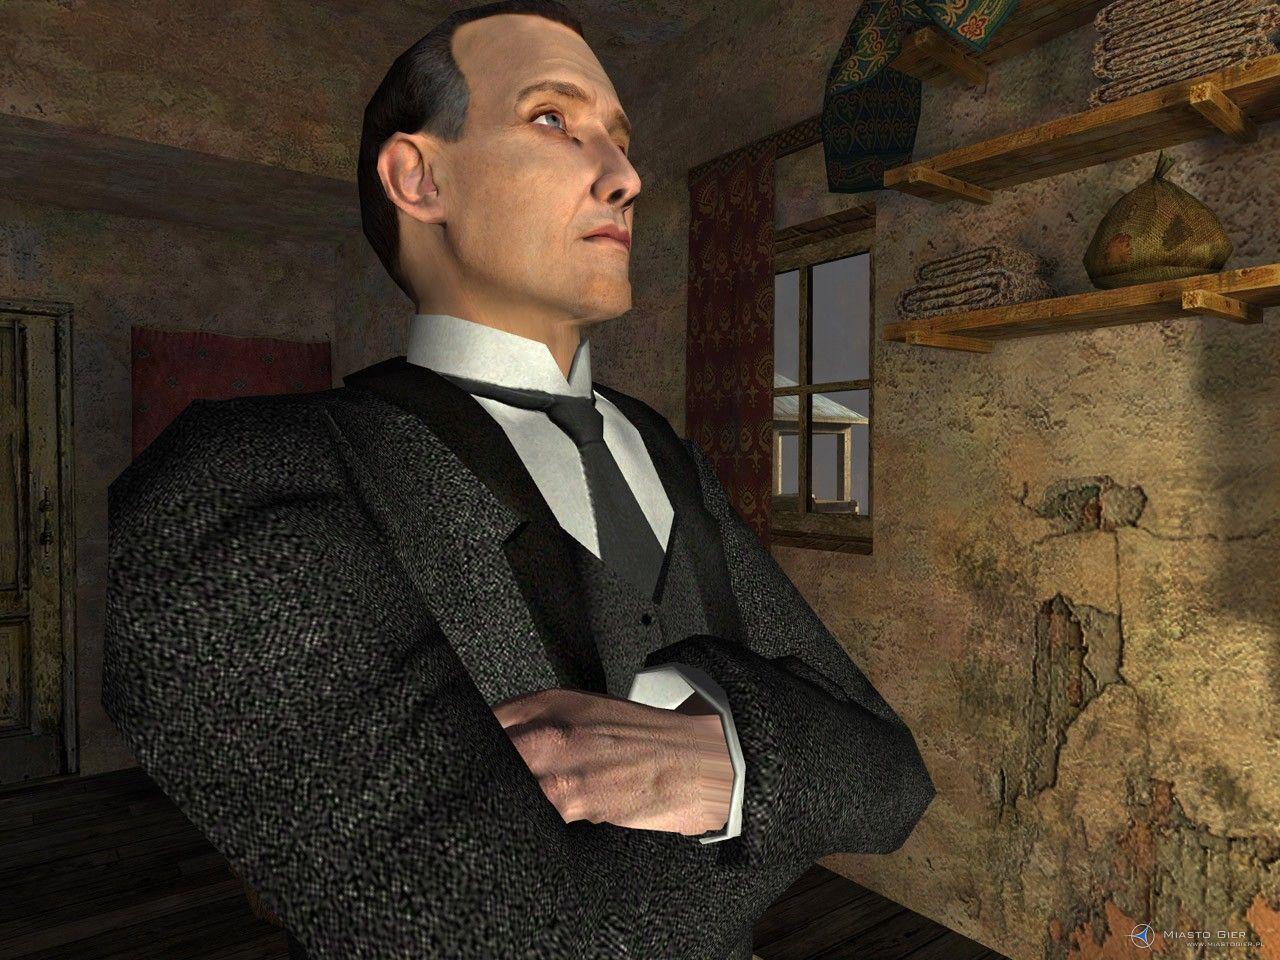 www.miastogier.pl/baza/Encyklopedia/gry/SherlockHolmesTheAwakened_PC/Galeria/sherlock_014.jpg